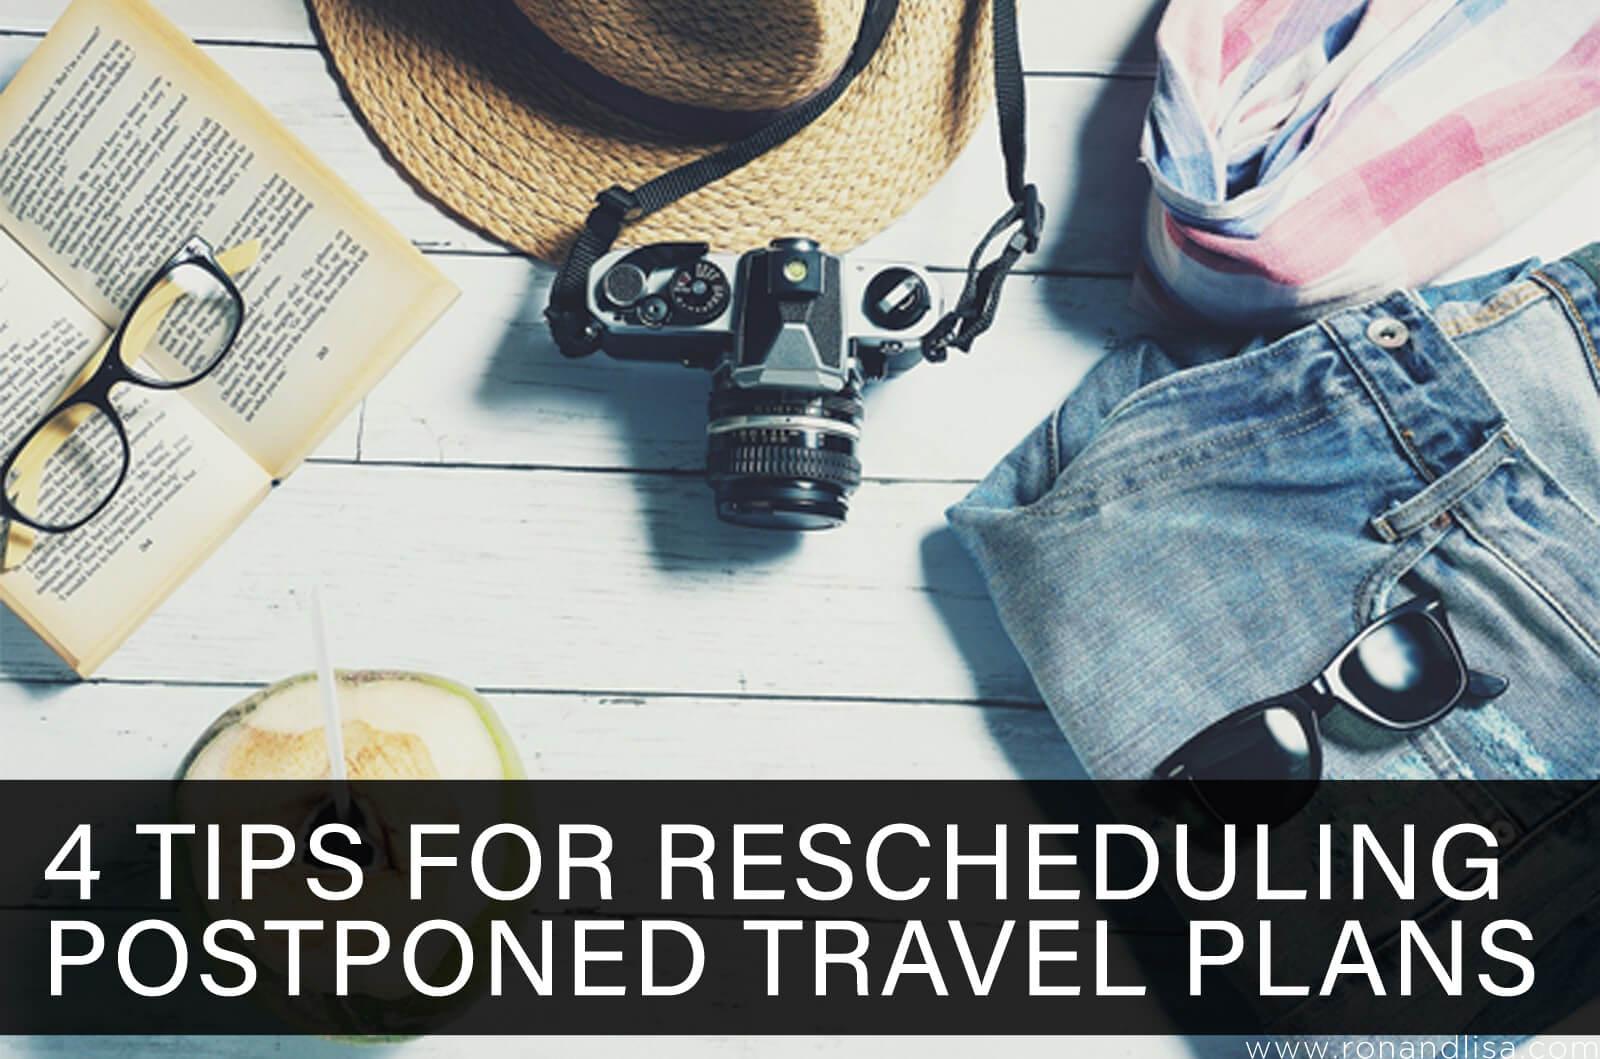 4 Tips for Rescheduling Postponed Travel Plans